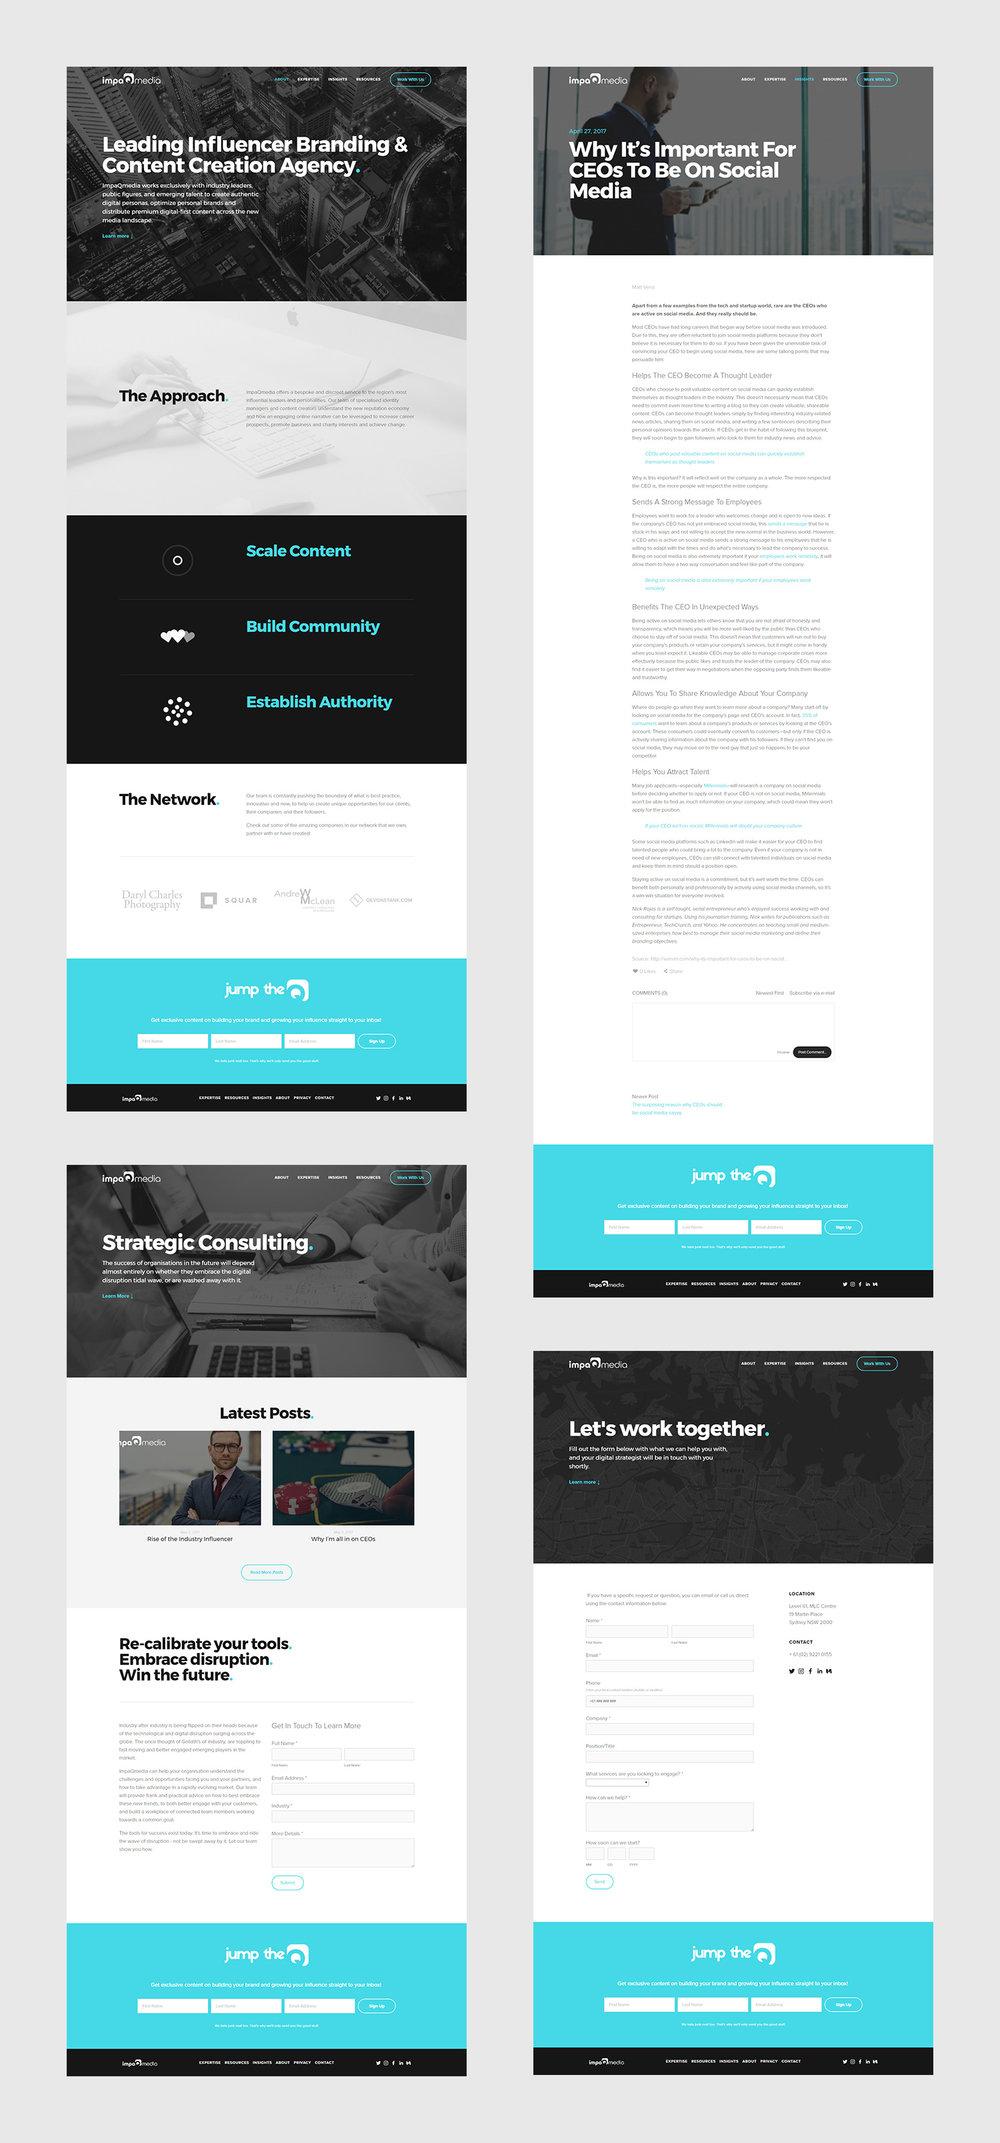 squarespace-content-creation-agency-portfolio-2.jpg